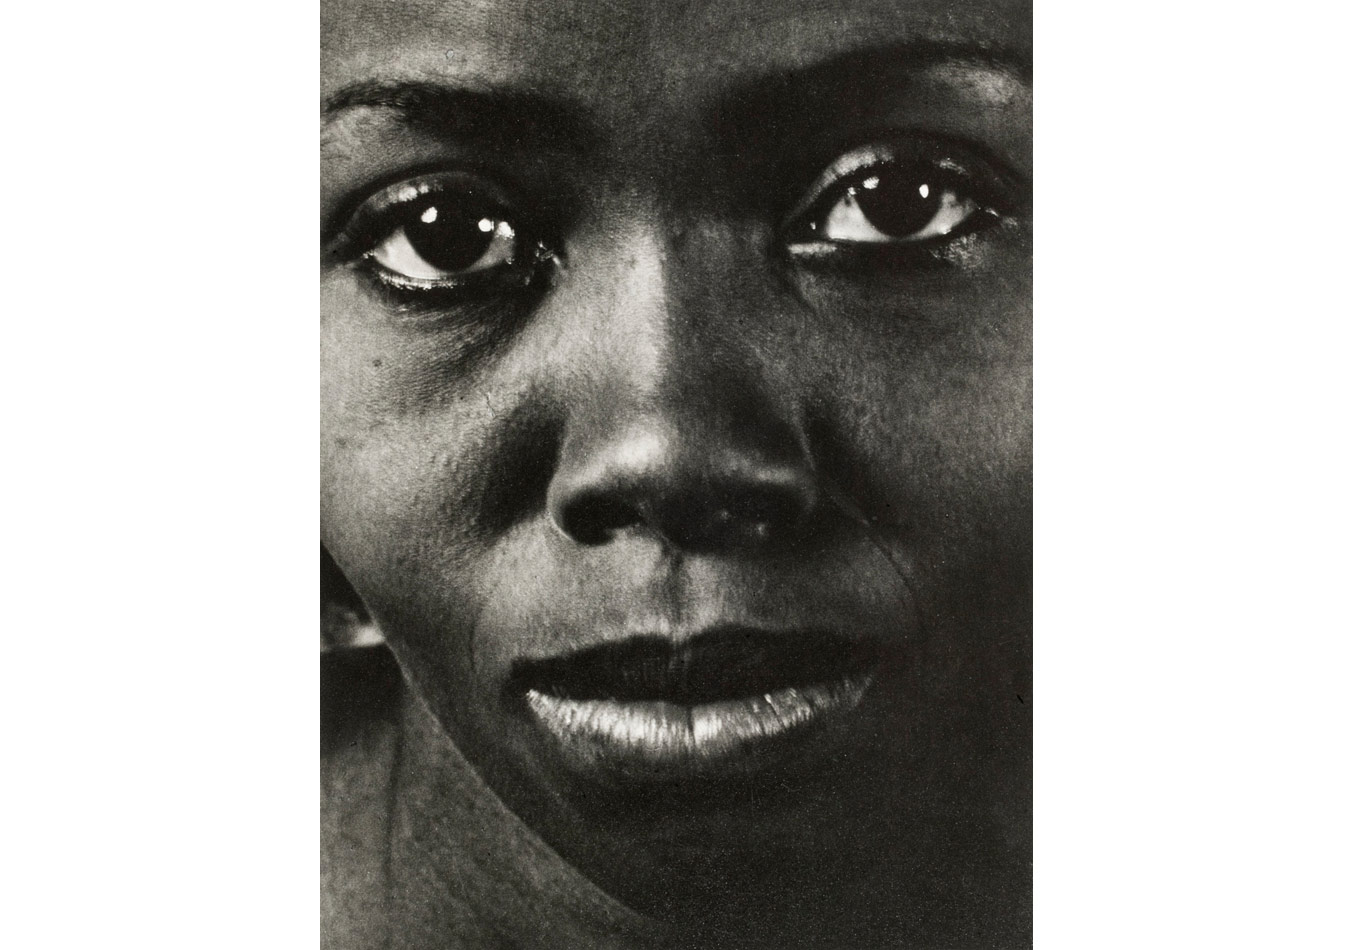 Consuelo Kanaga, Annie Mae Merriweather, 1936 © Collection International Center of Photography, New York